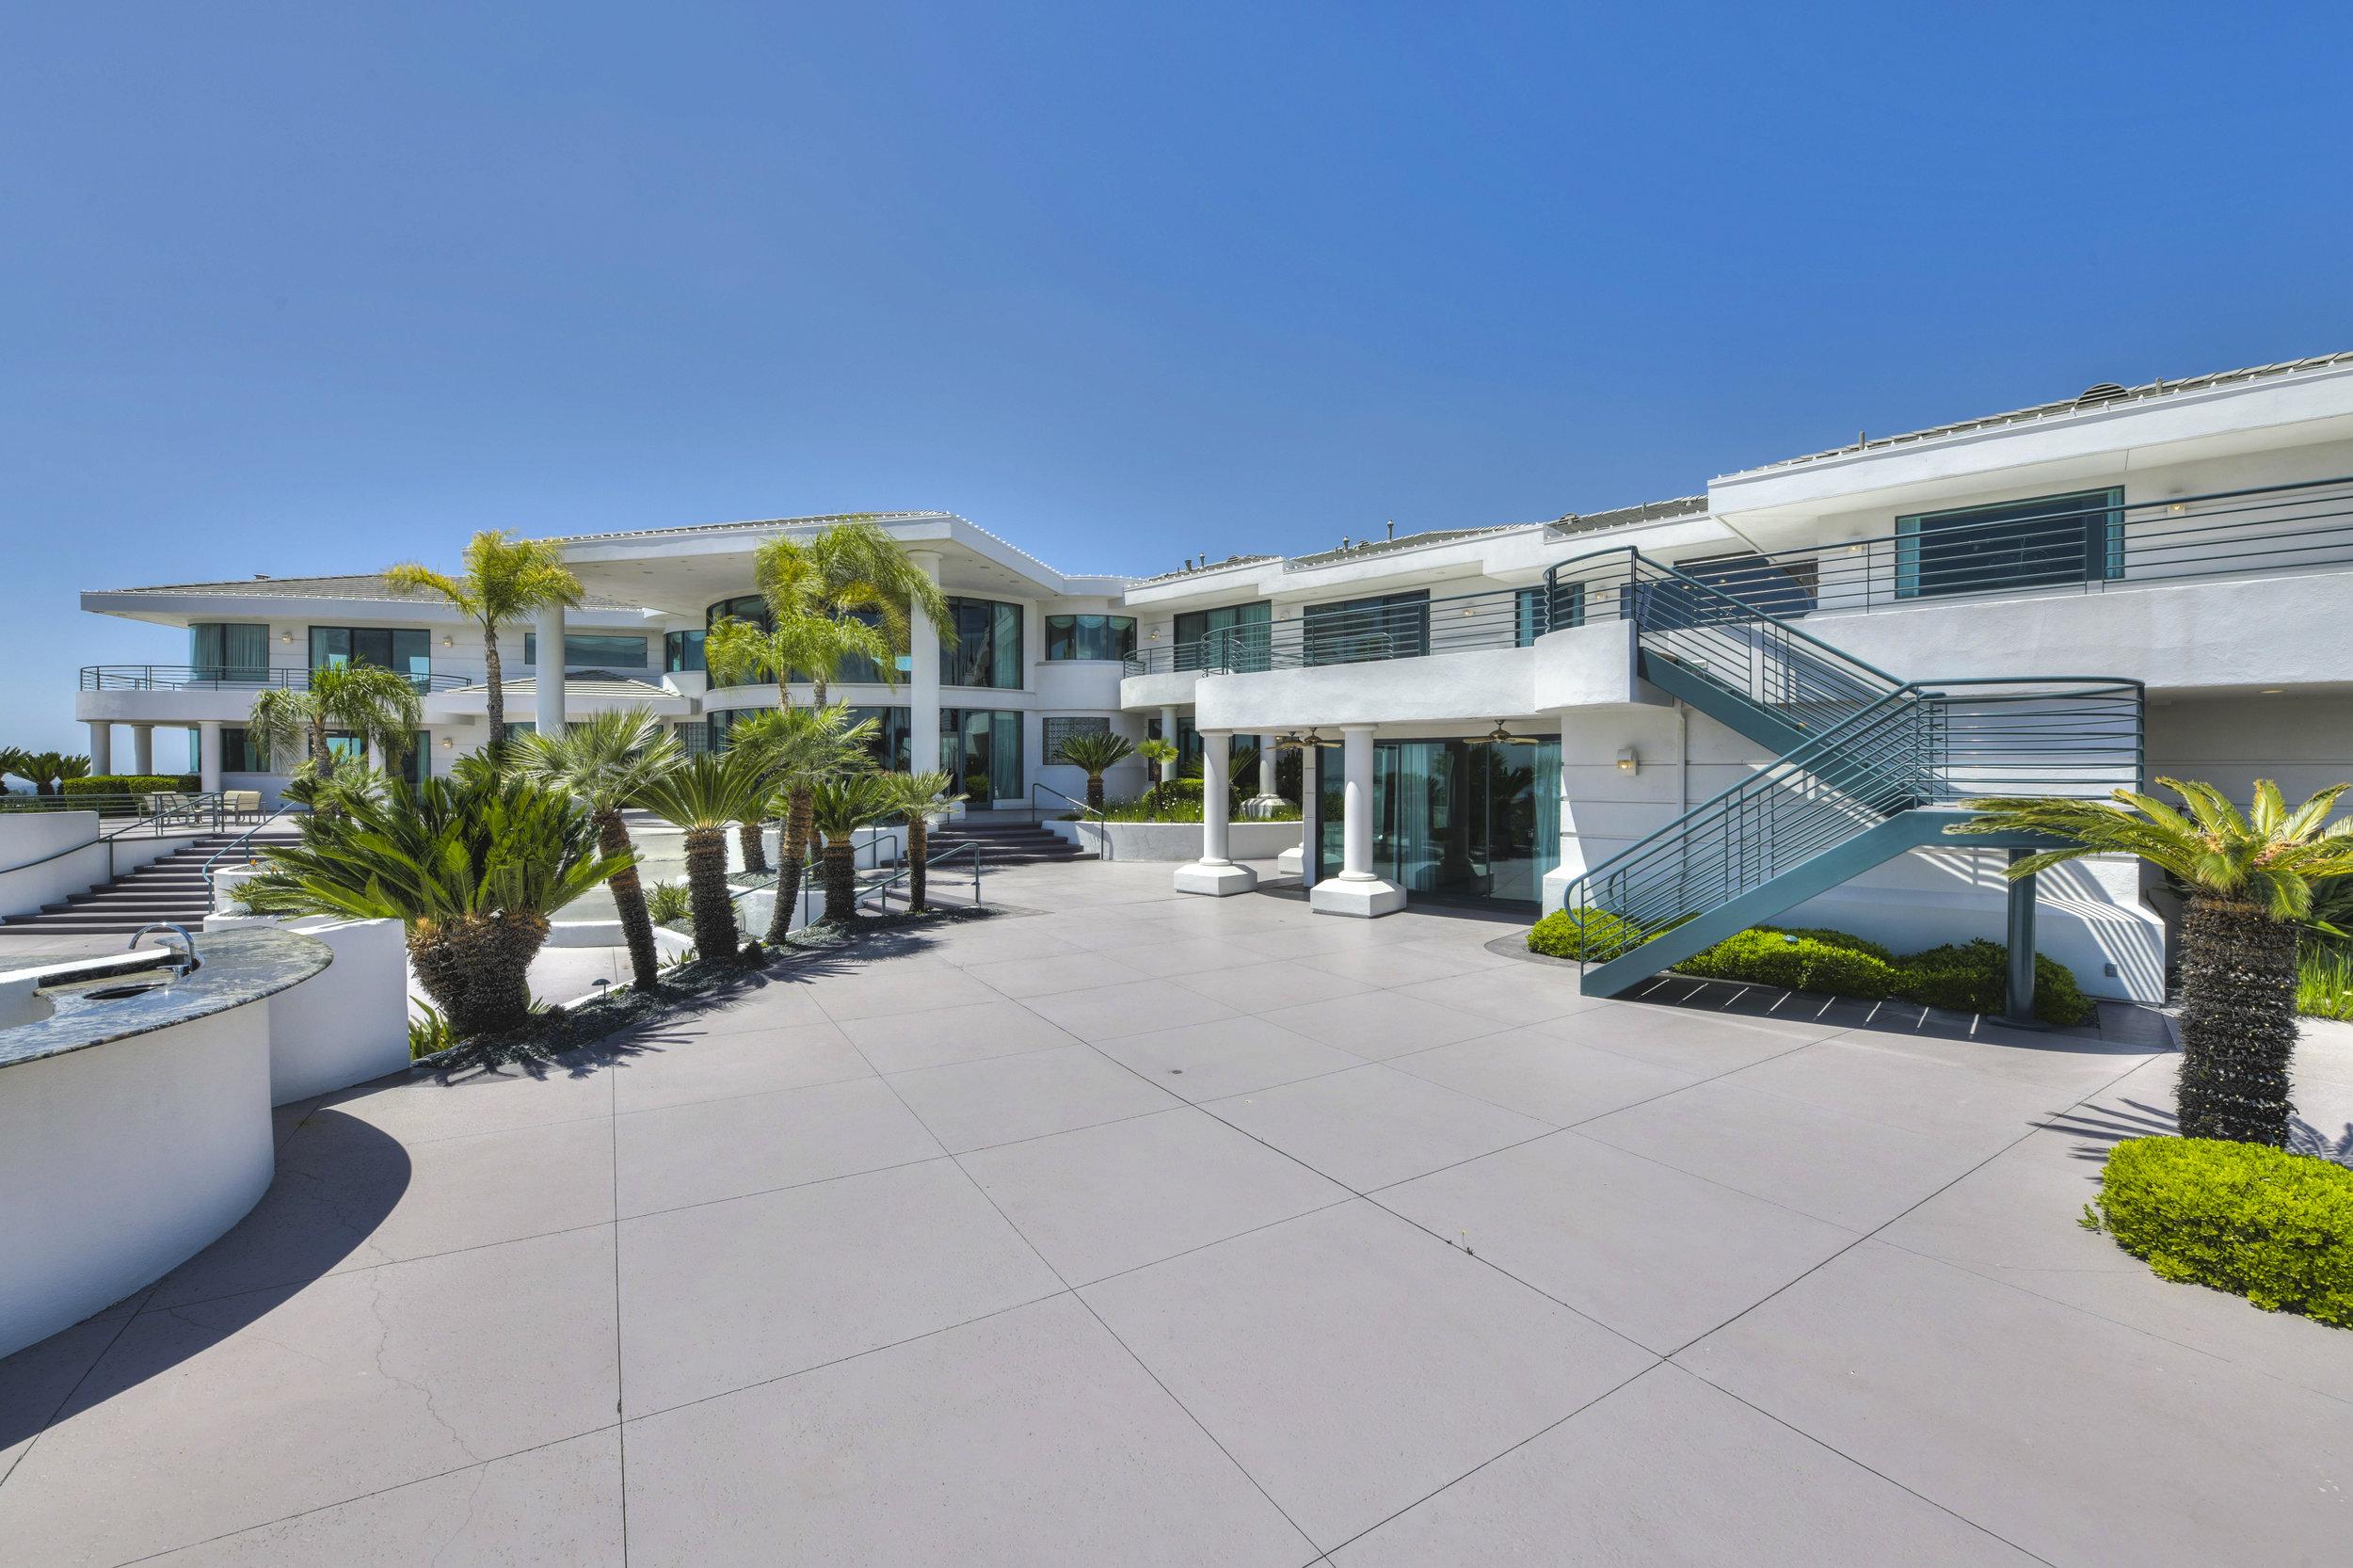 9125 Vista De Lago Court 15.jpg